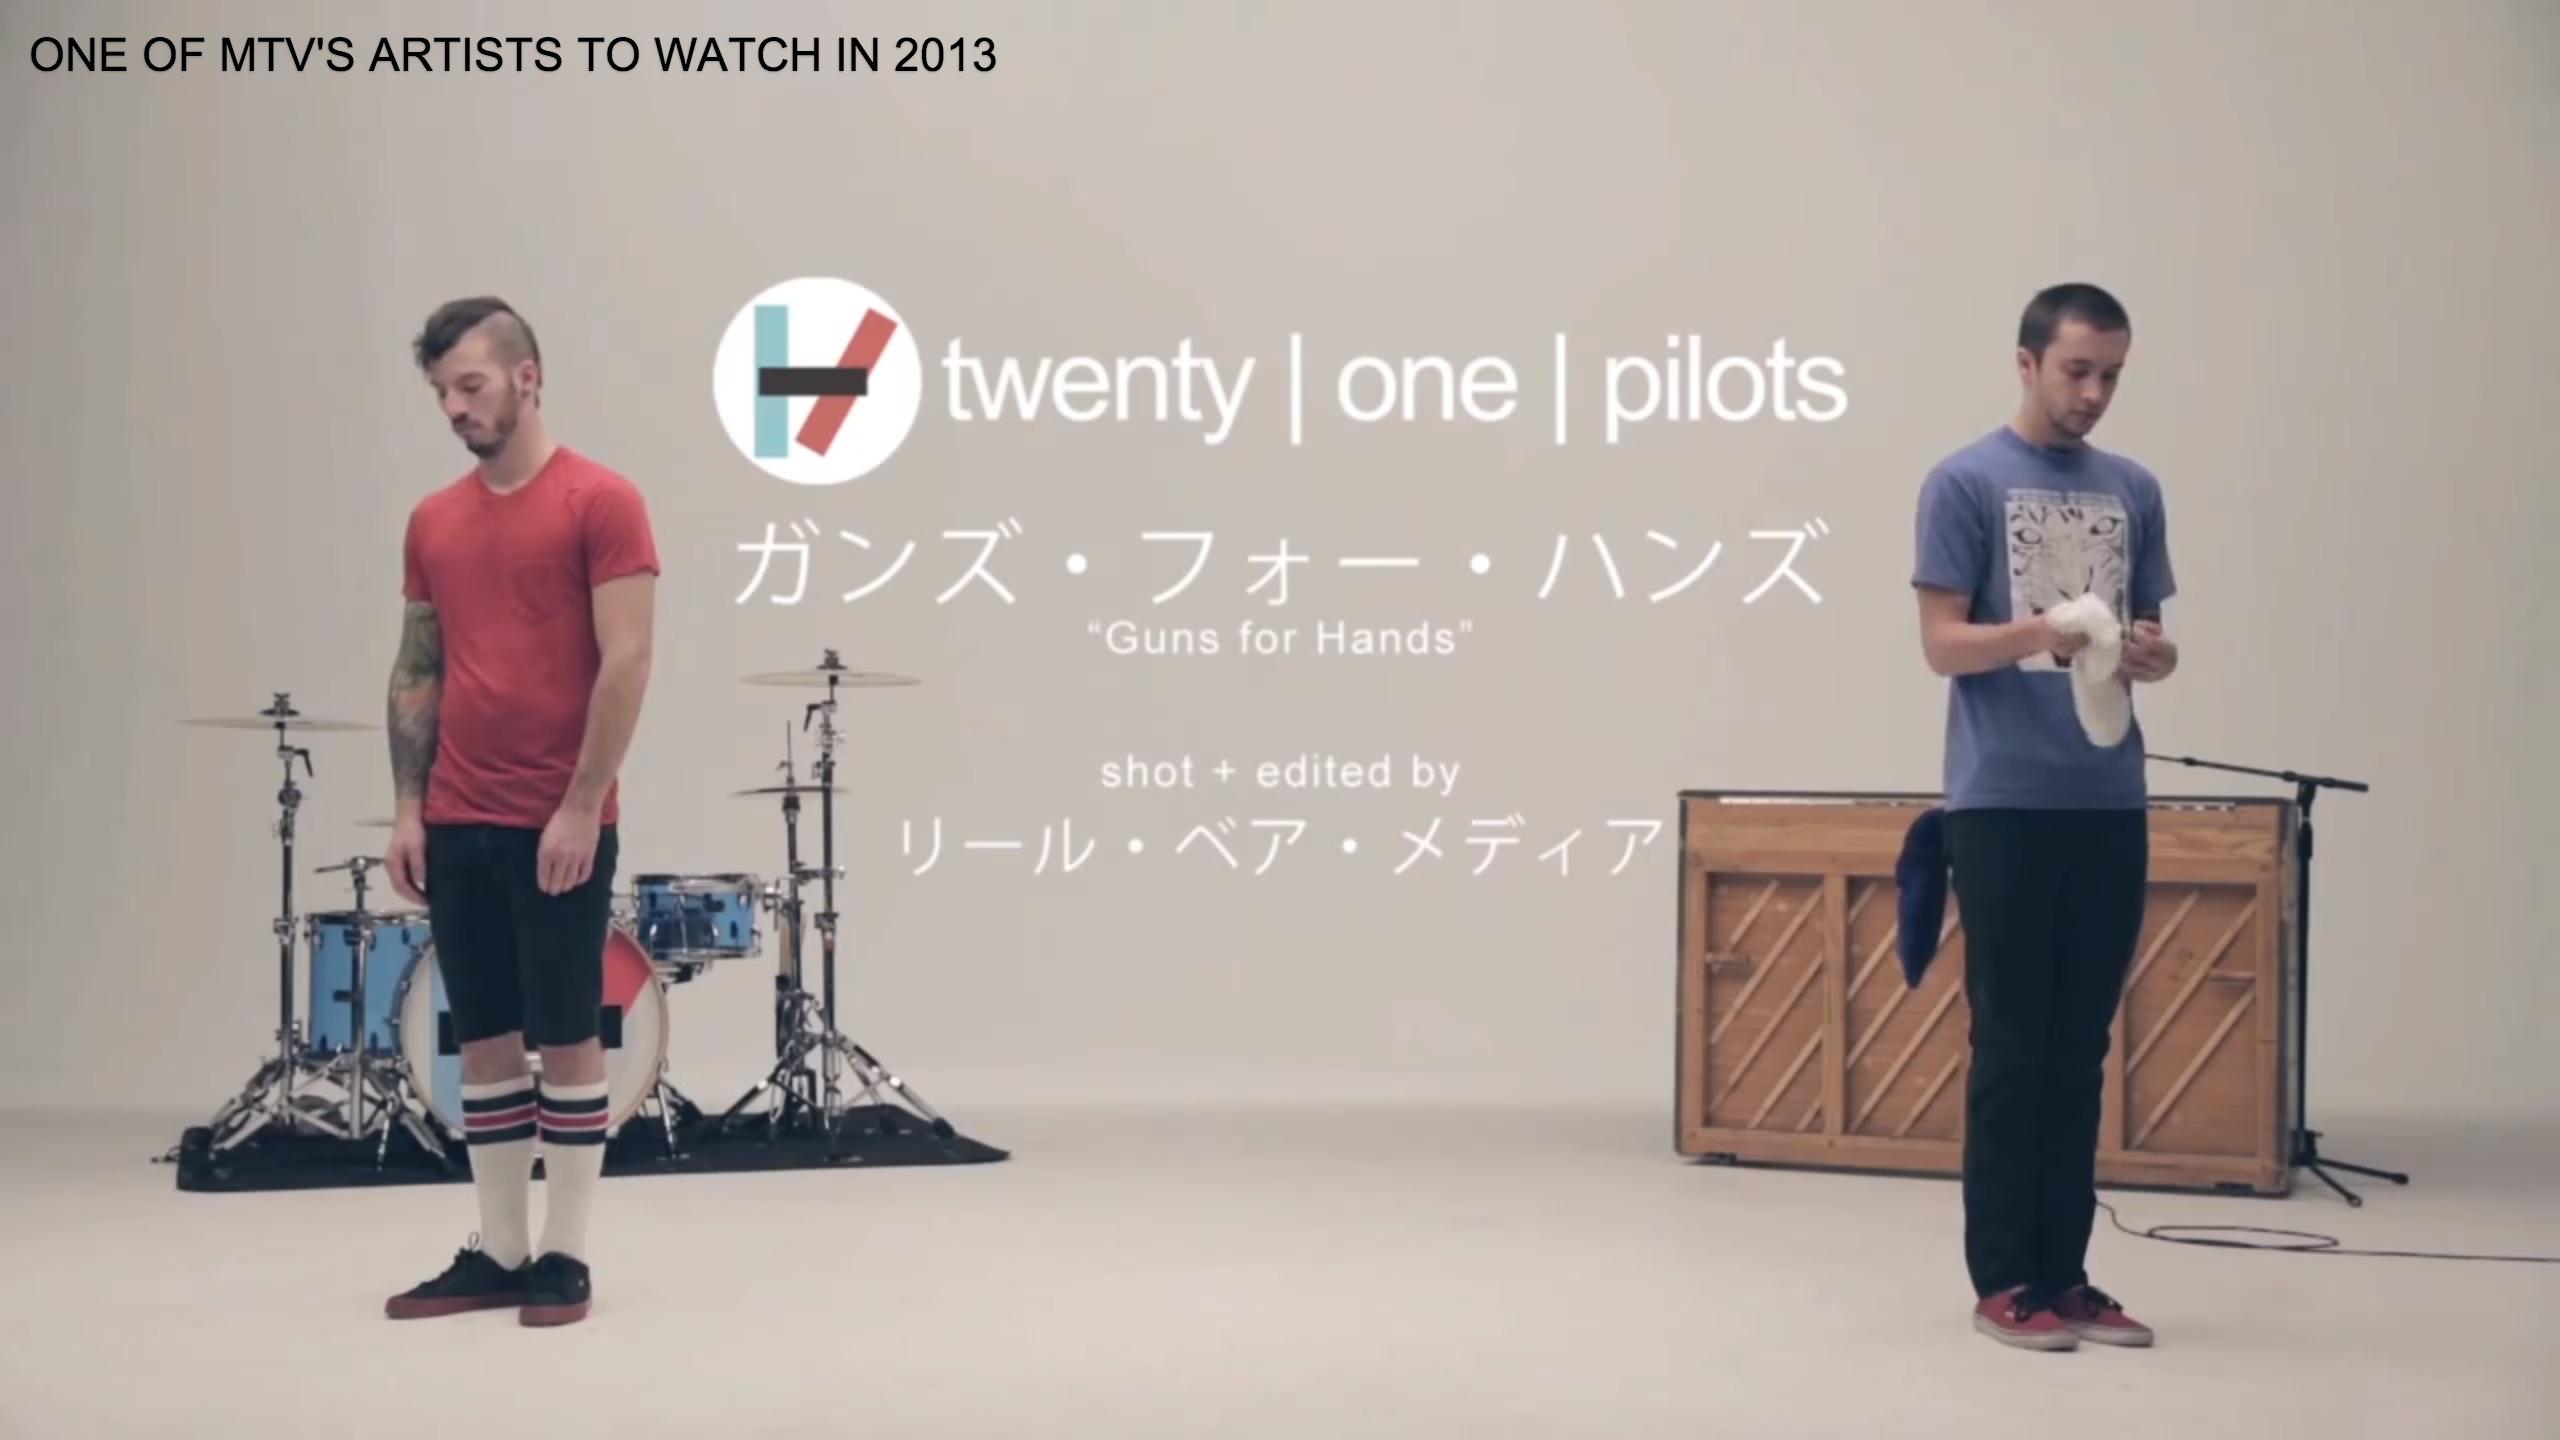 twenty | one | pilots『Guns For Hands』PV | 2012年CM起用で話題の男性デュオ